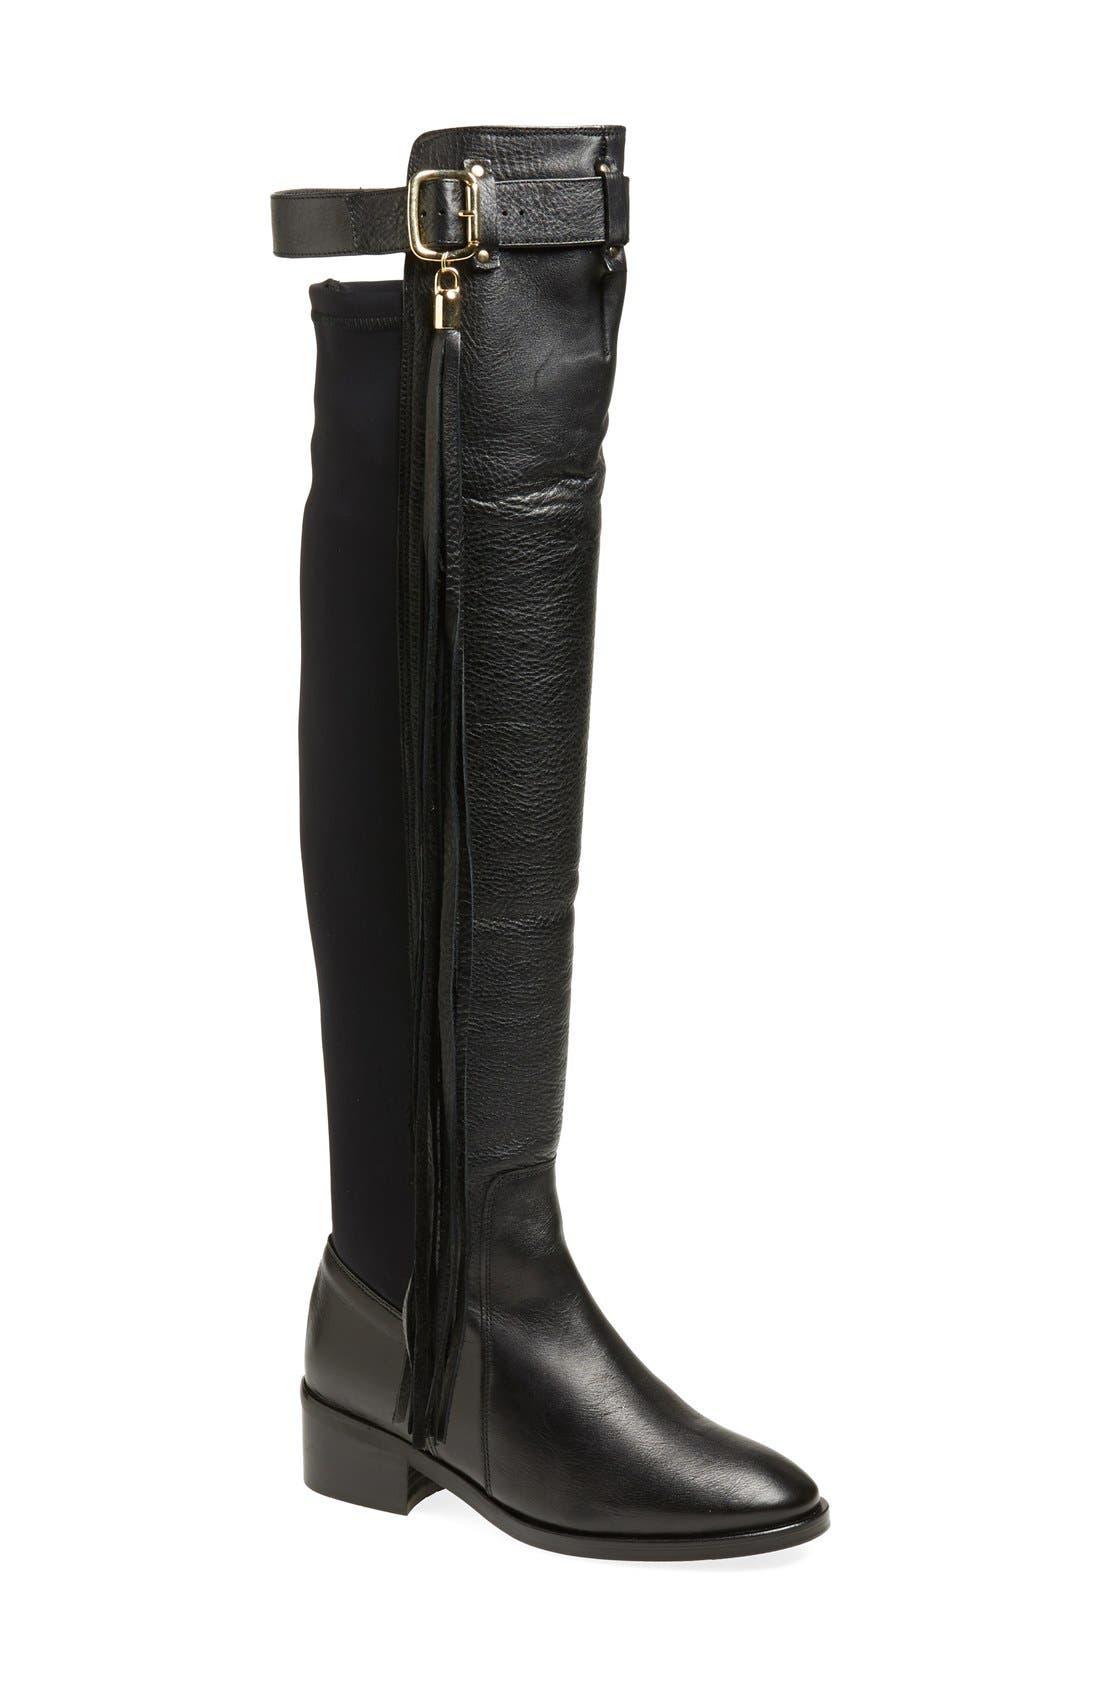 Alternate Image 1 Selected - KG Kurt Geiger 'Vixen' Over the Knee Leather Boot (Women)